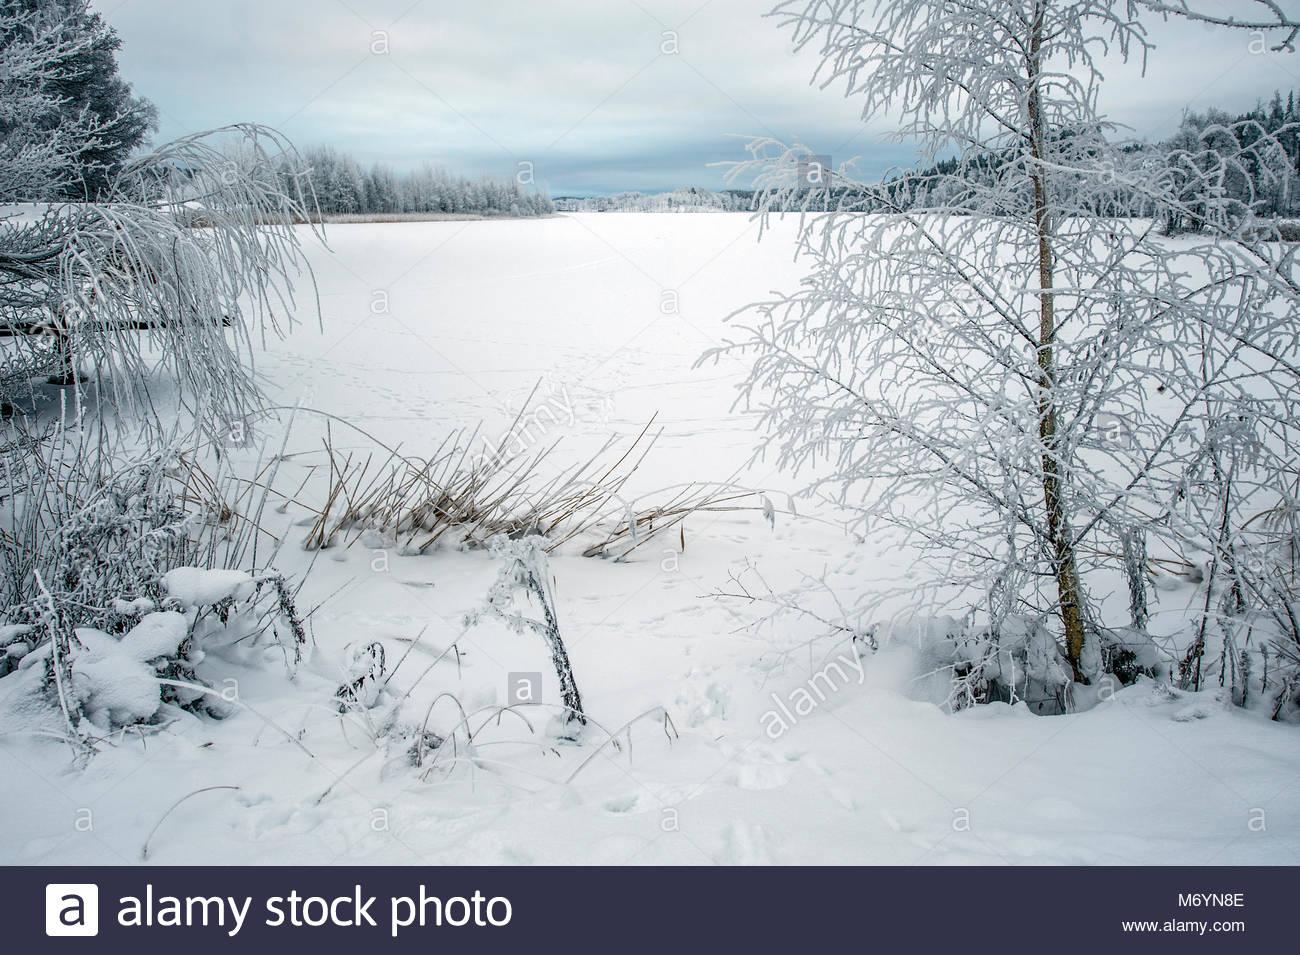 Winter wonderland in Sweden - Stock Image